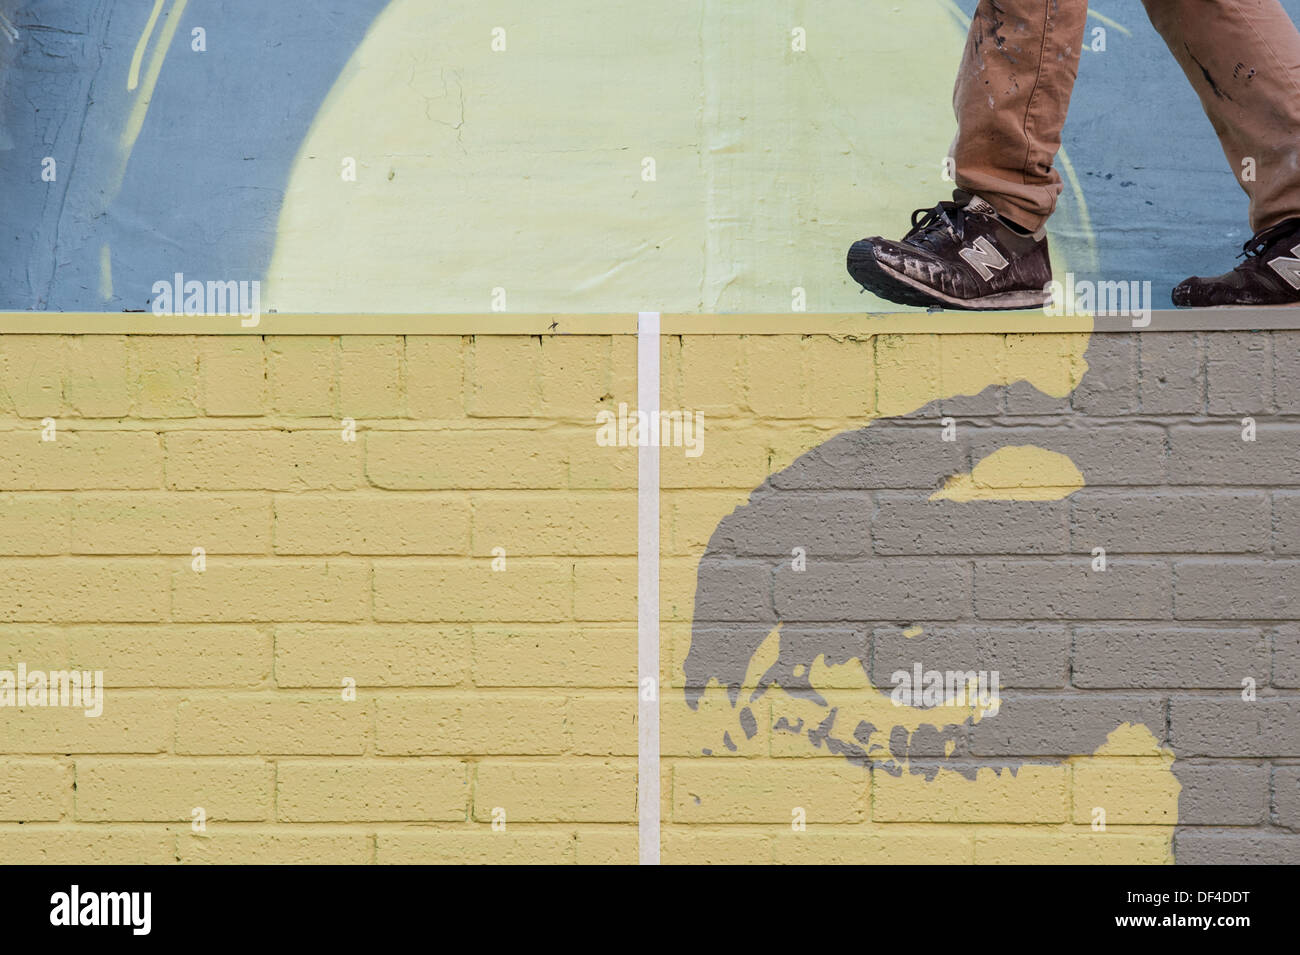 Twiggy. Street Art. Manchester. - Stock Image